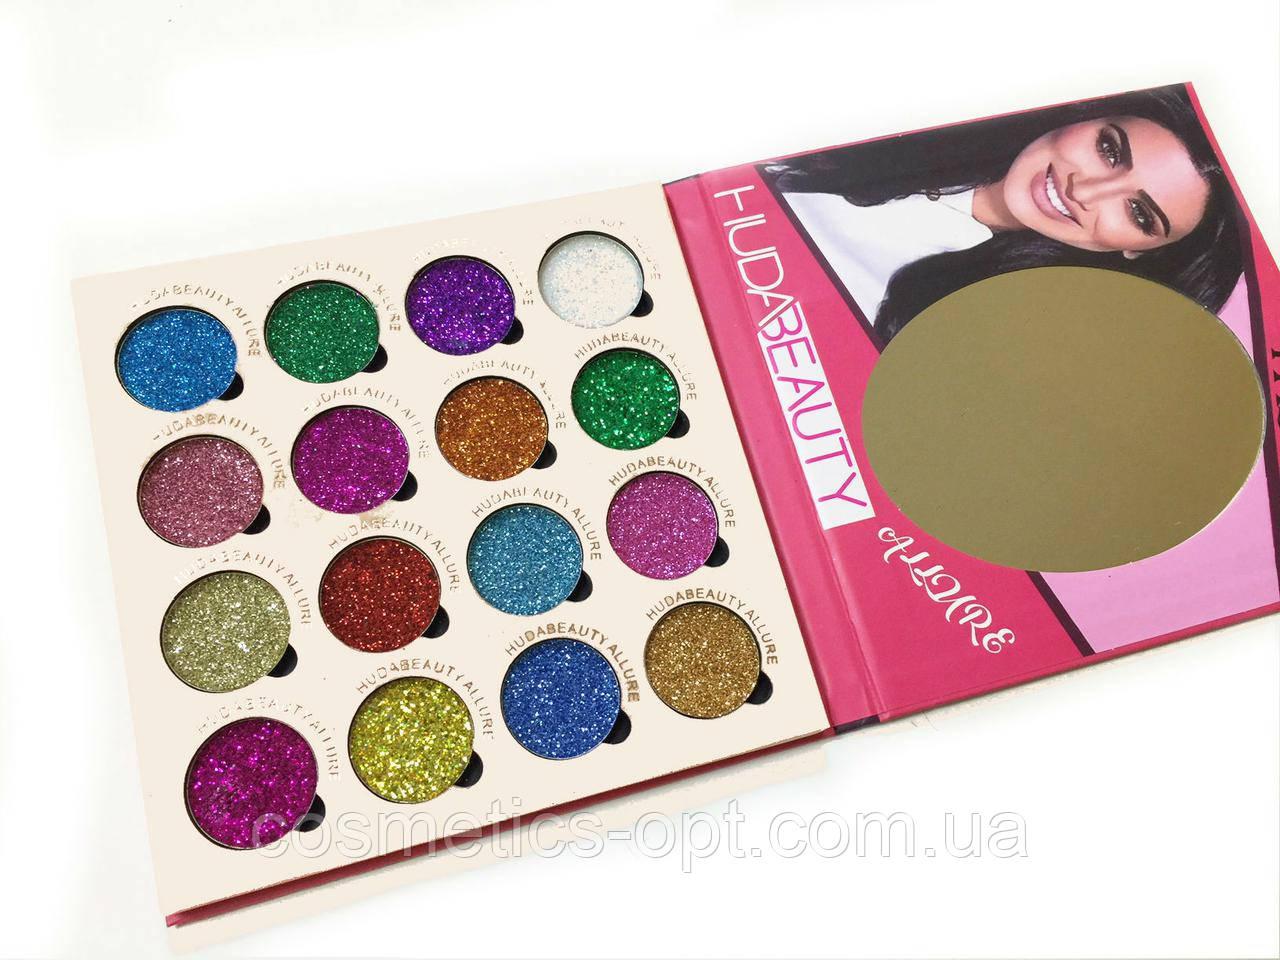 Глитер Huda Beauty Allure 16 Colors of Eyeshadow Glitter Pallete (реплика)